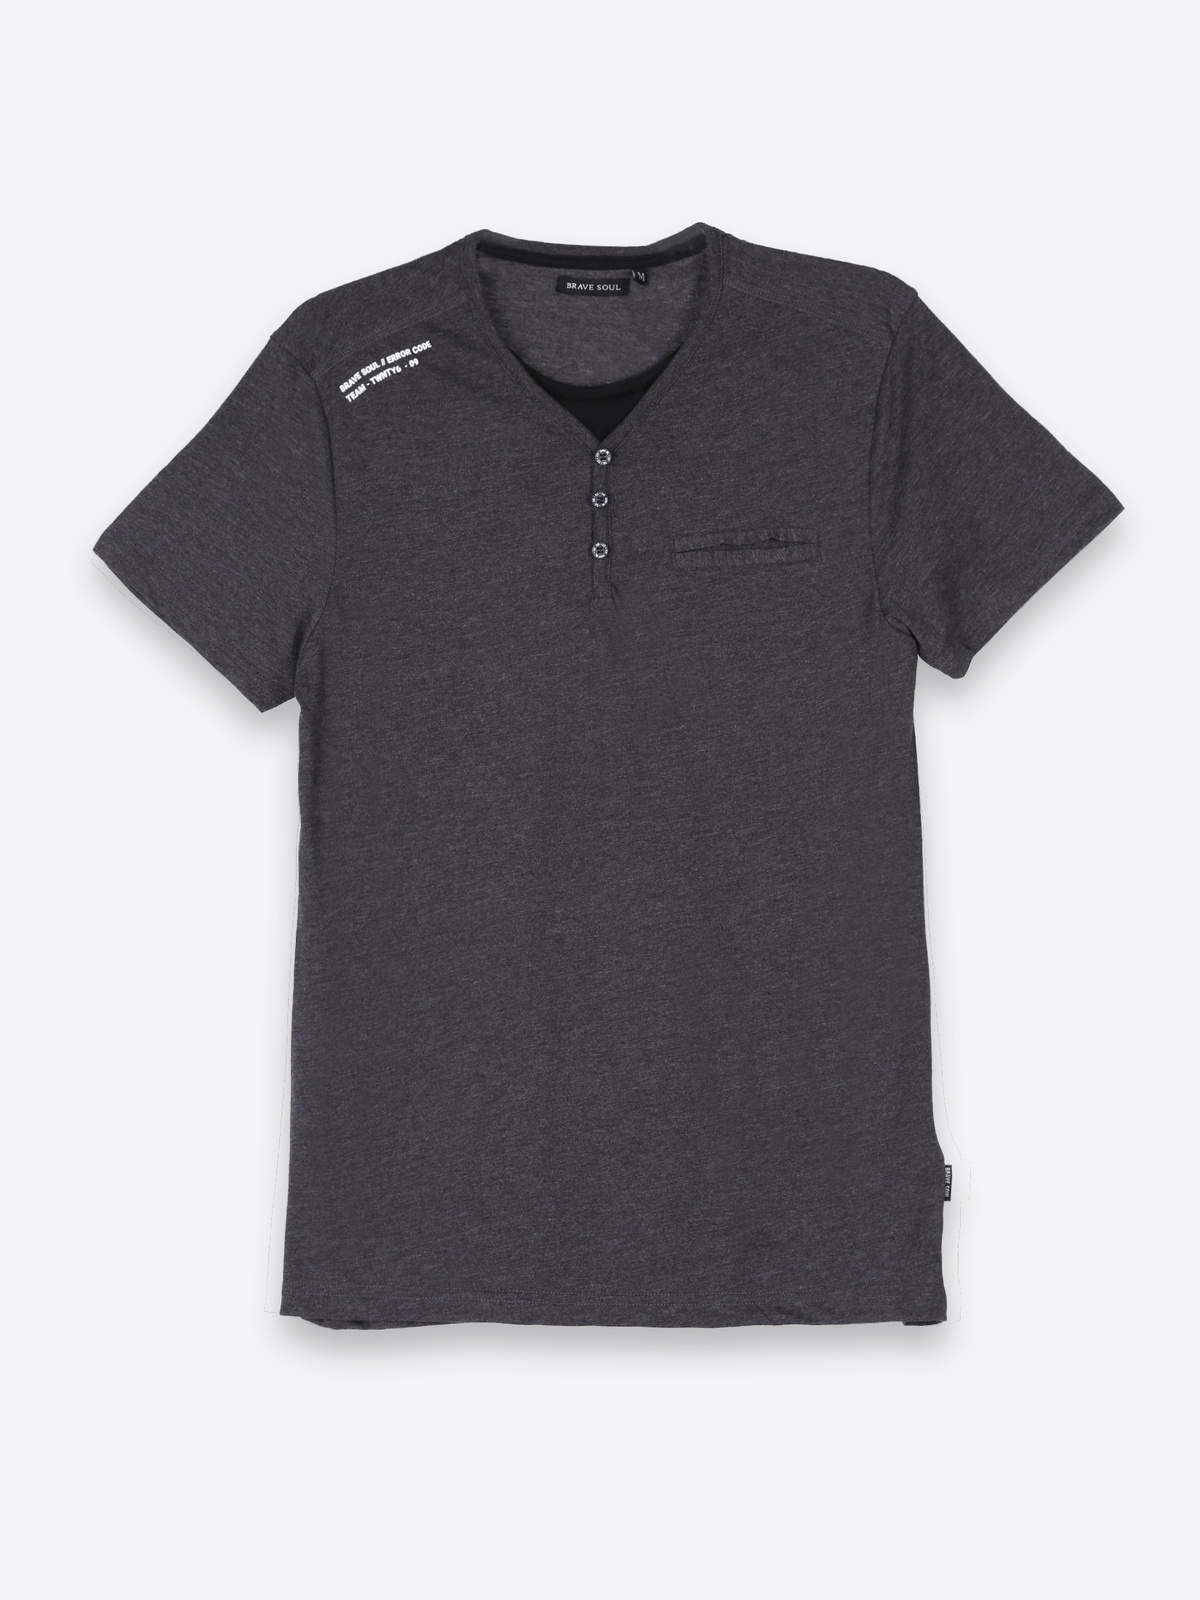 DRYWASH ανδρικό t-shirt